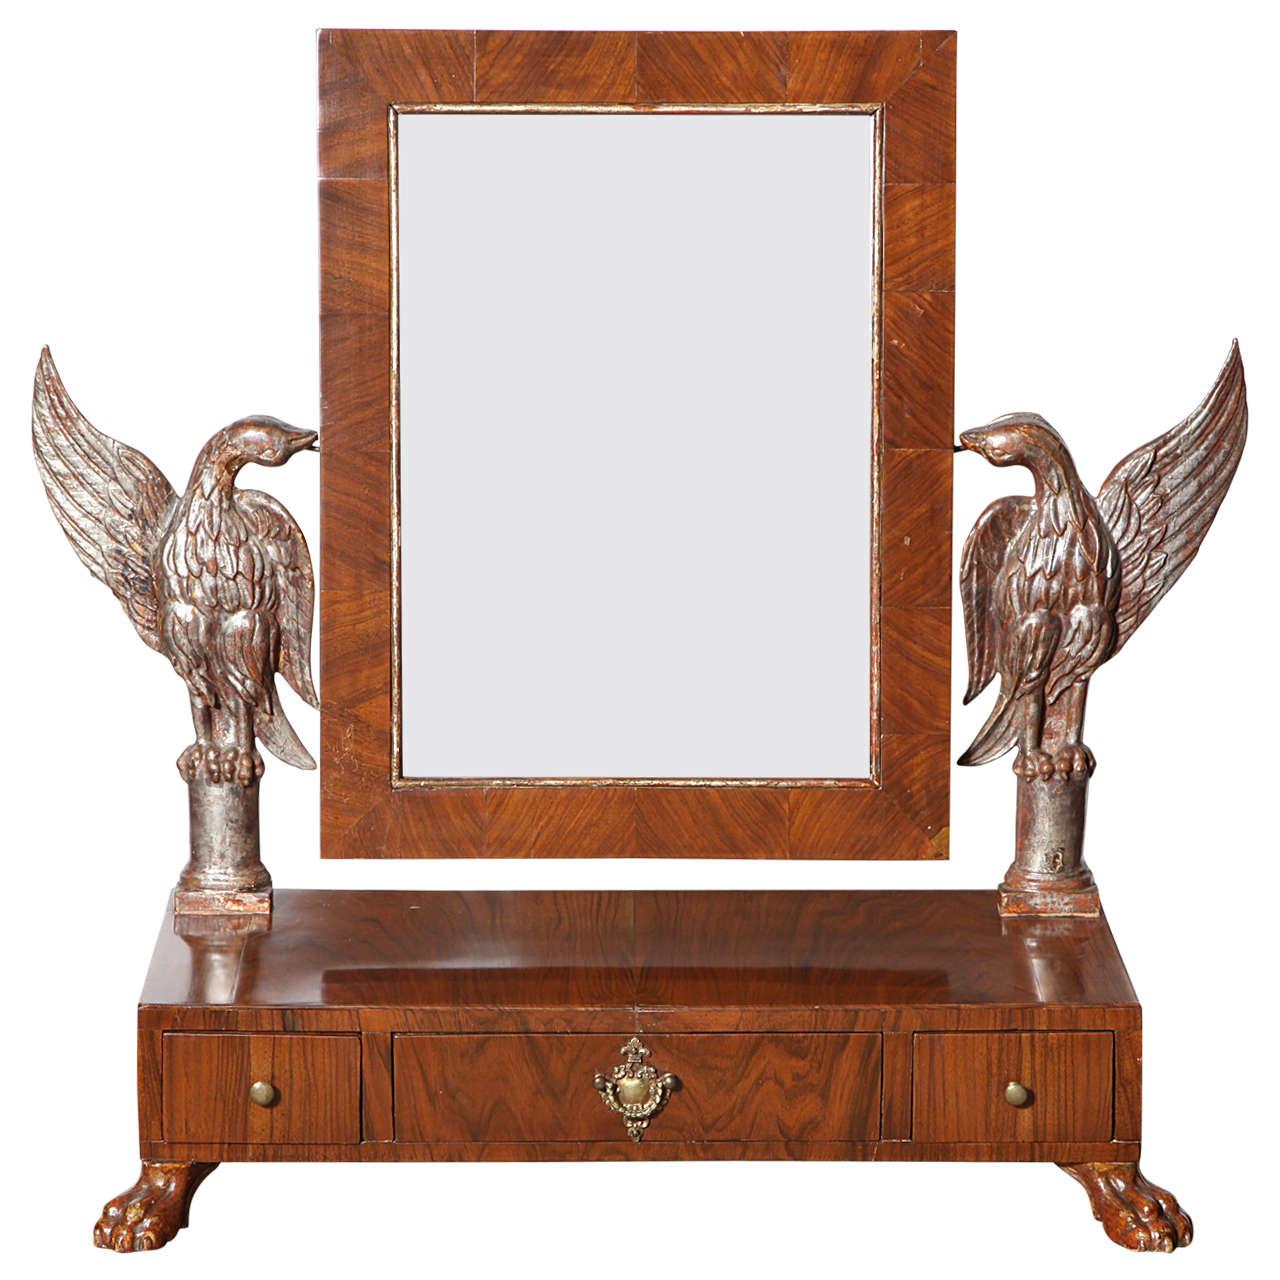 19th Century Italian Dressing Mirror